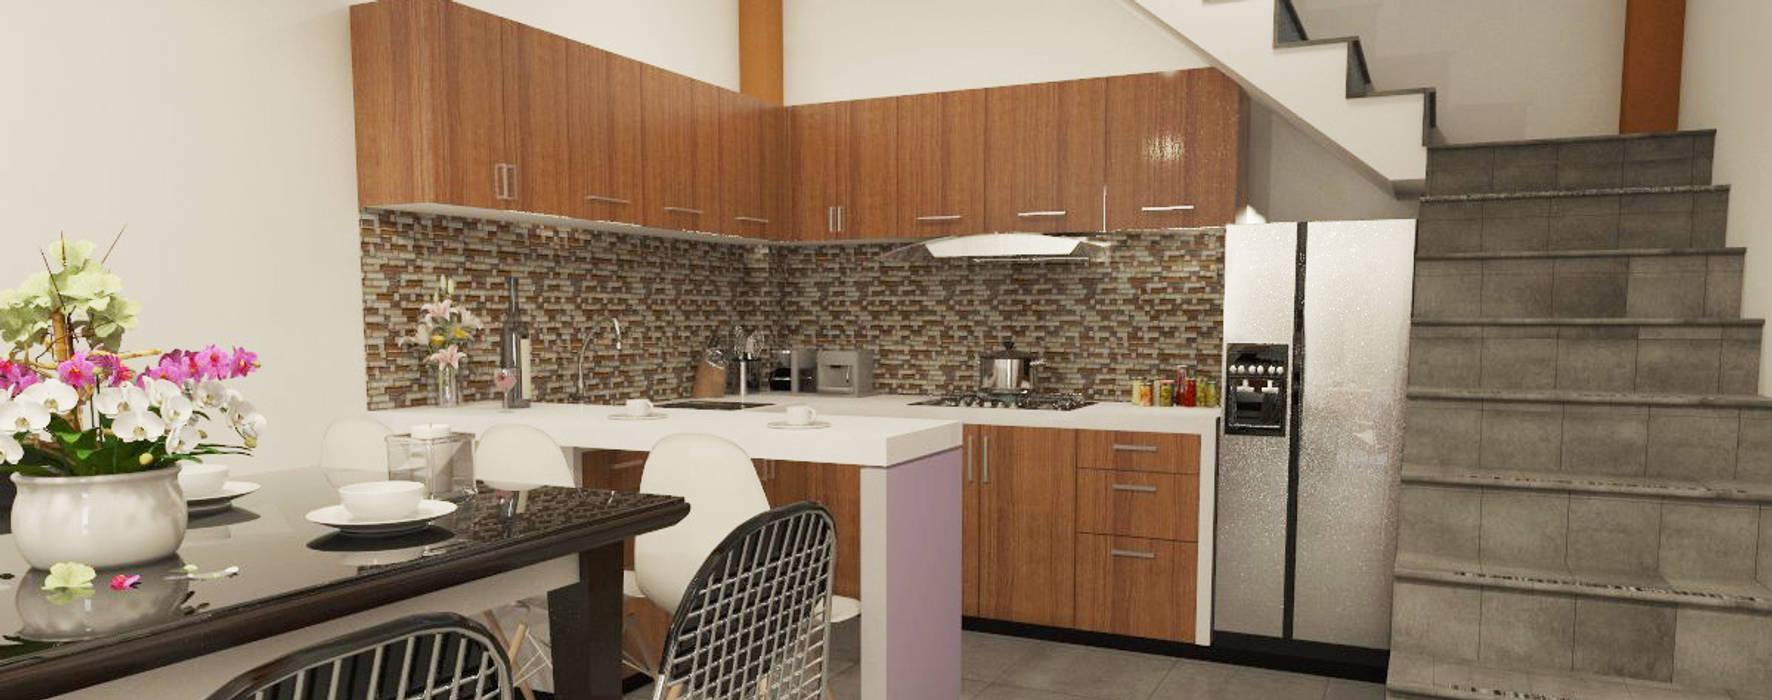 Oleh CN y Arquitectos Modern Keramik